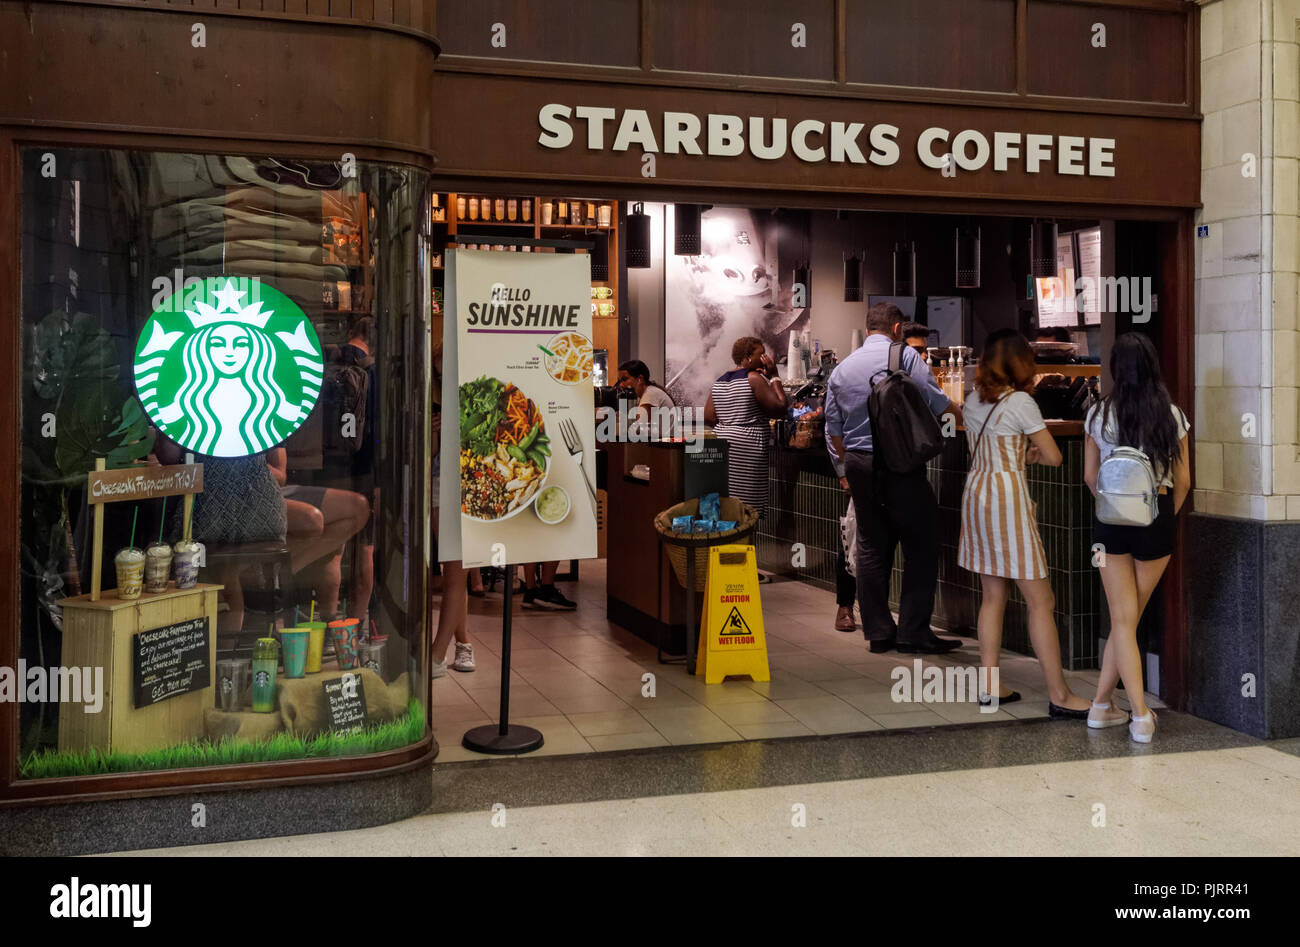 Starbucks Coffee Cafe In London England United Kingdom Uk